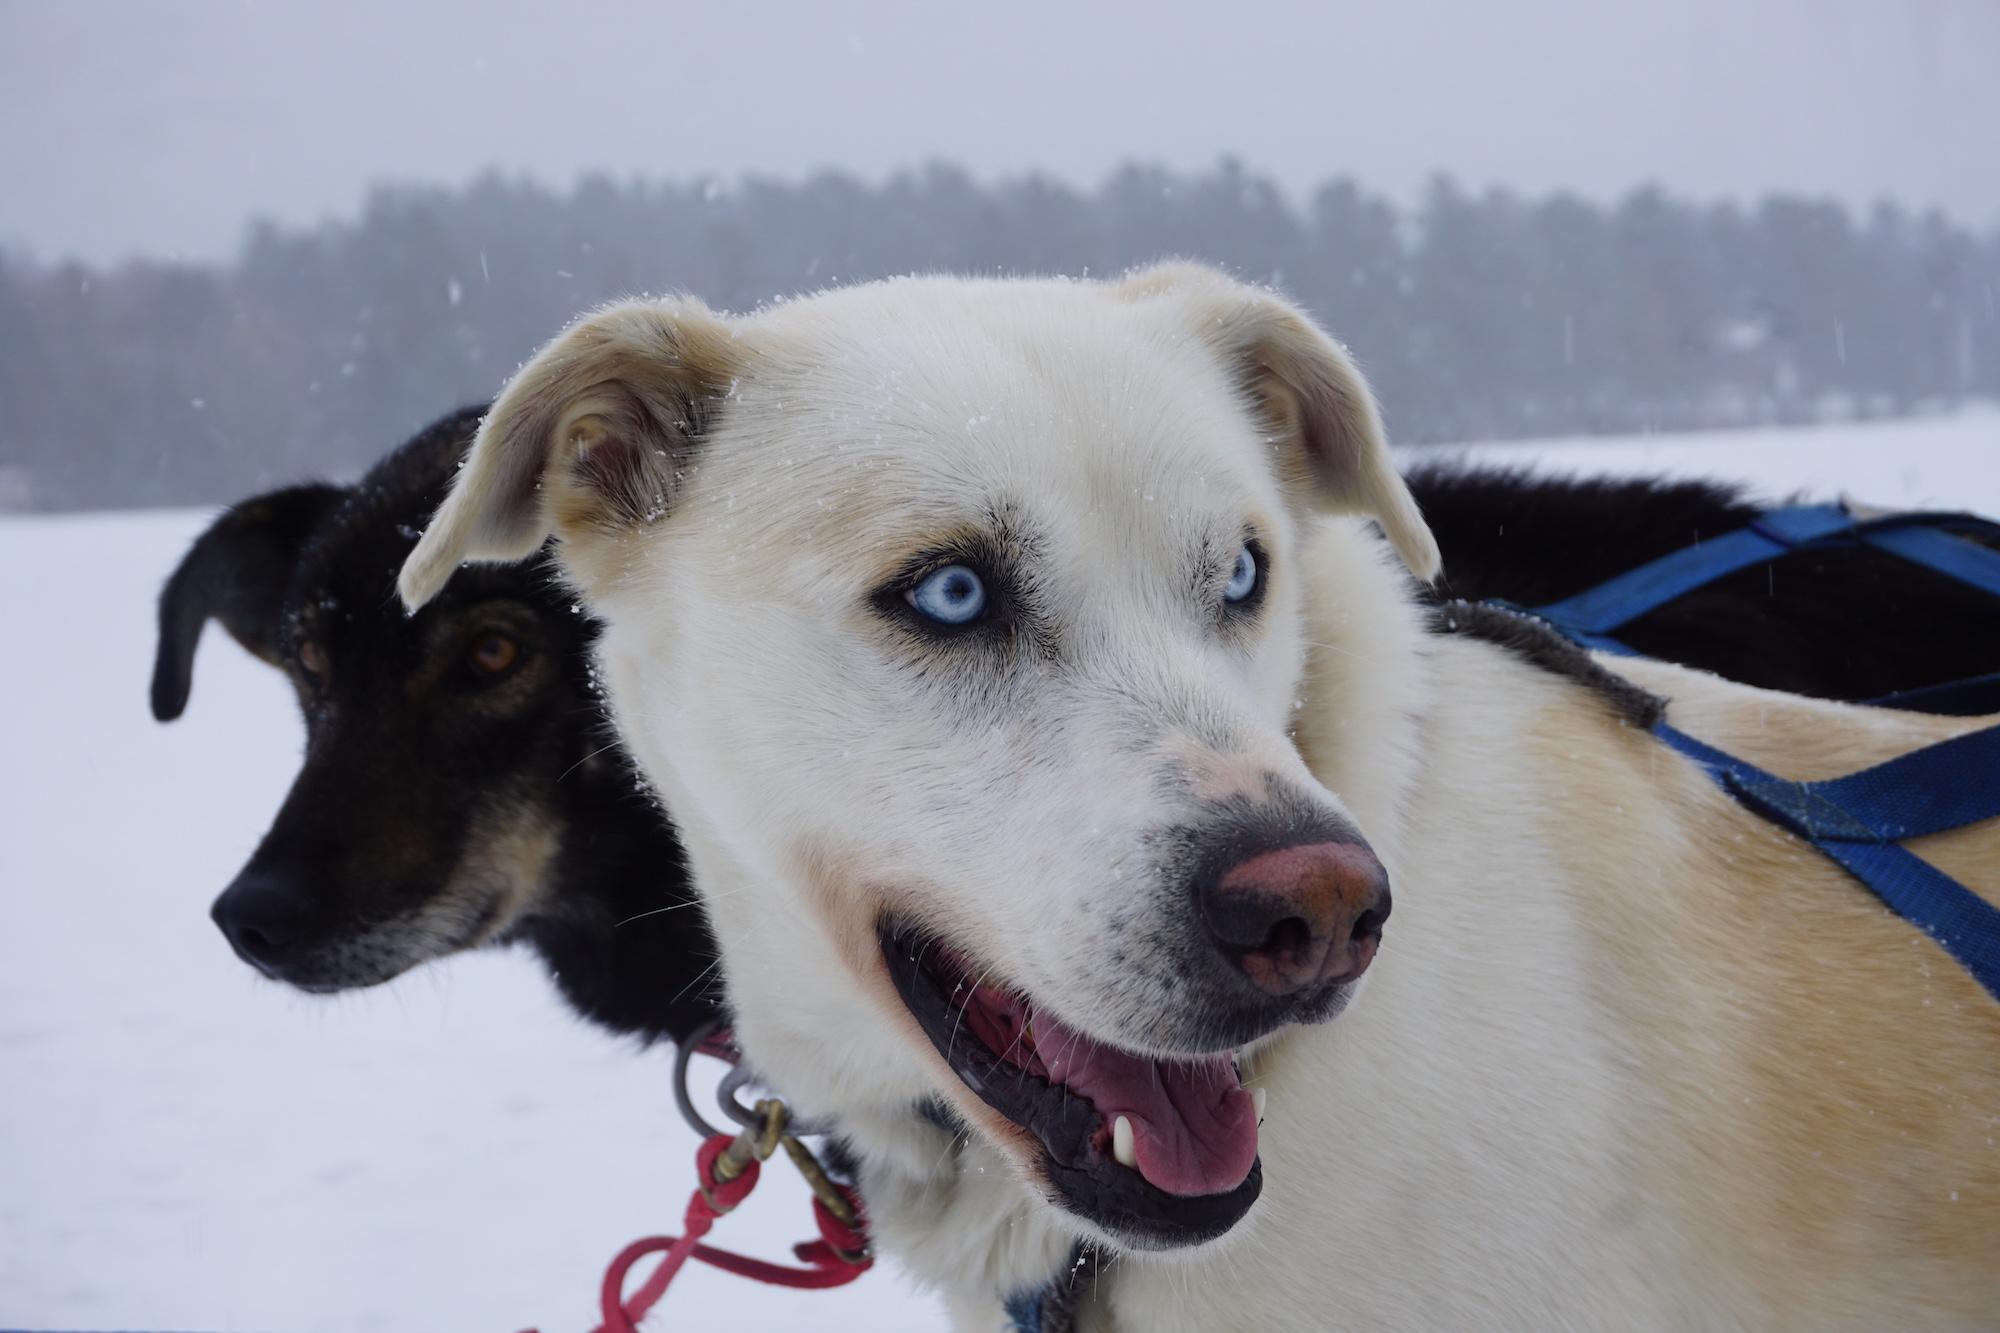 Lead Dogs, credit ADEN VERCELLETTO